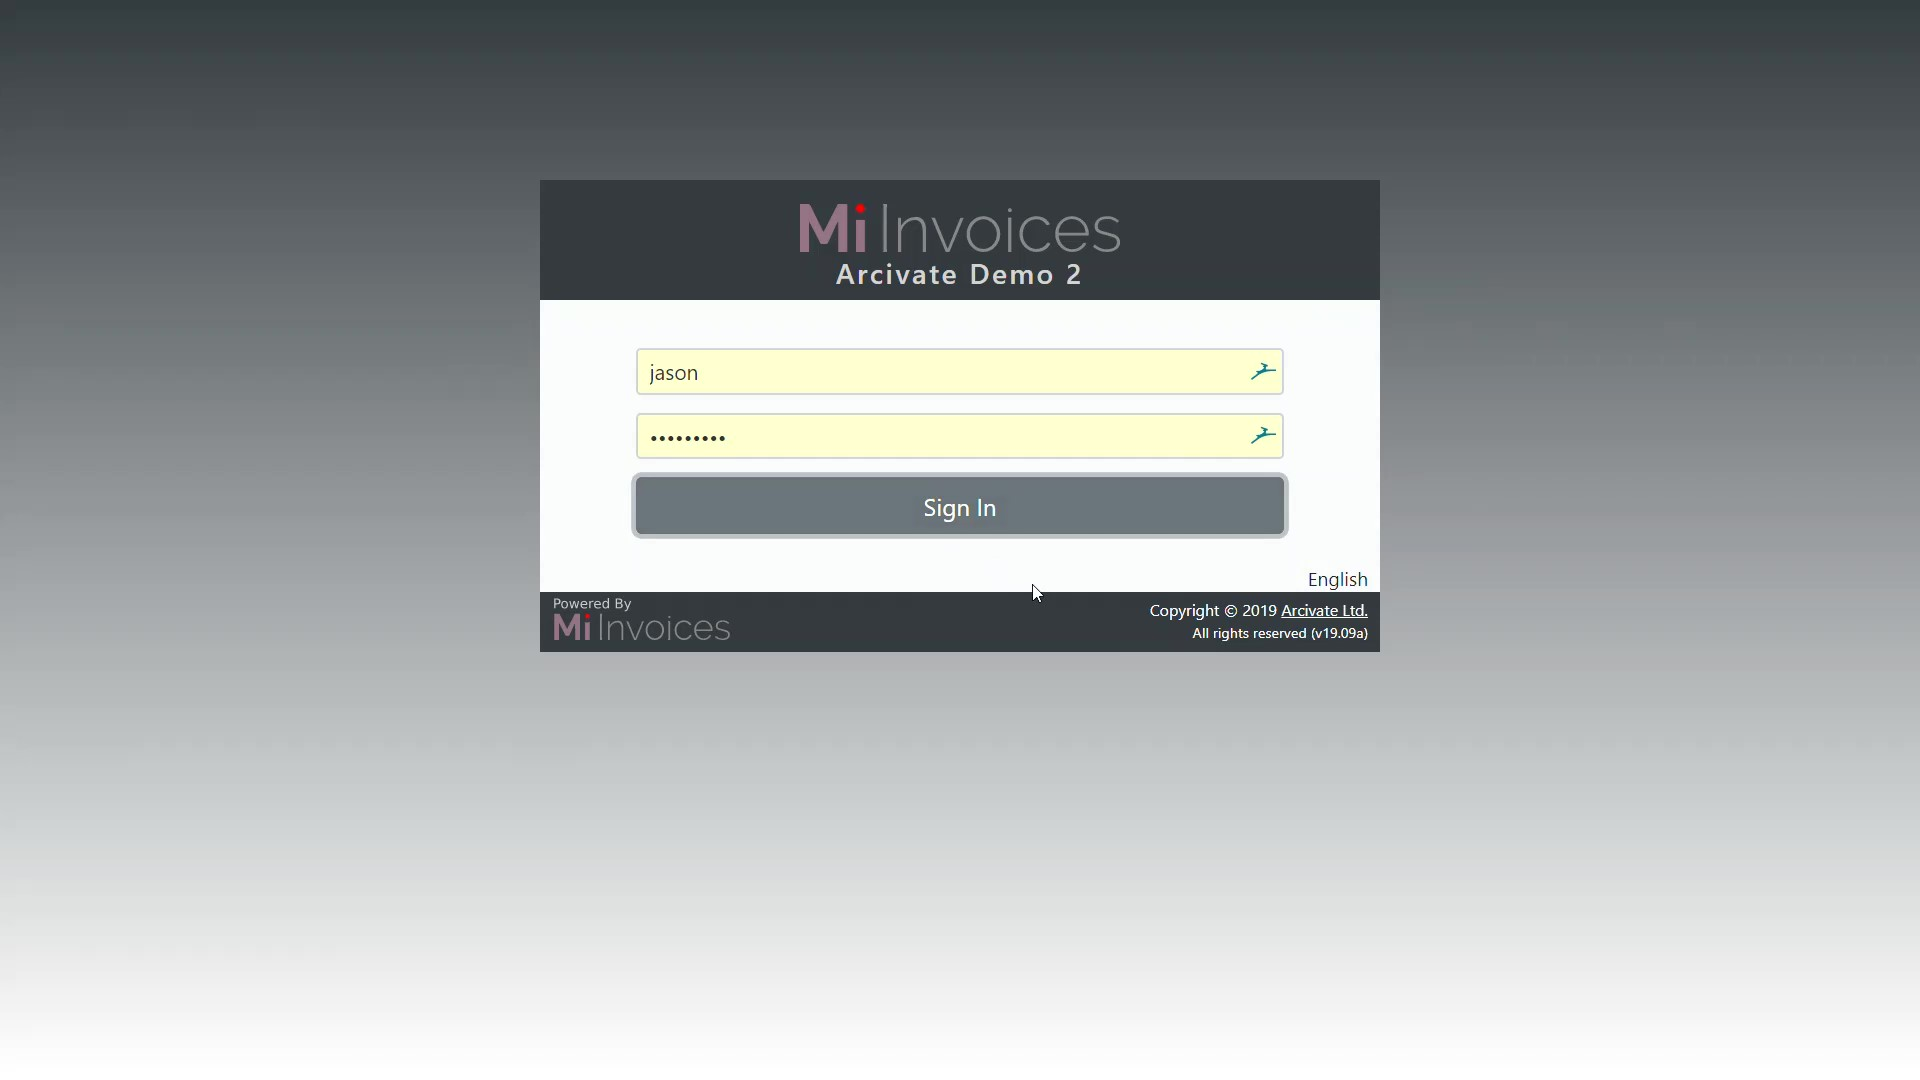 Website Mi Invoices